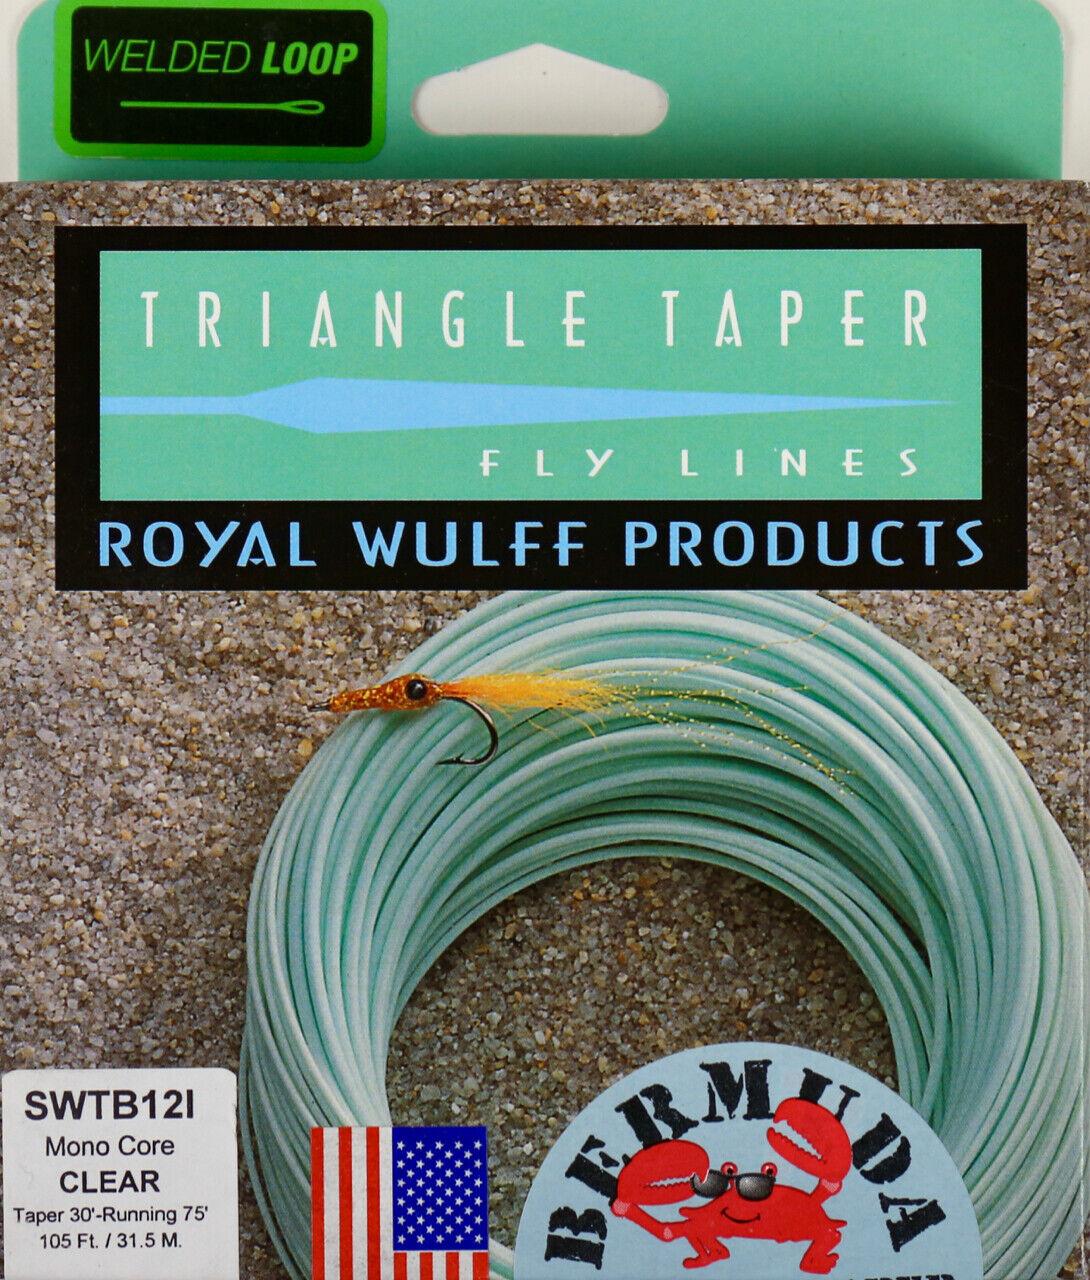 Royal Wulff Bermuda Triangle Taper Saltwater Intermediate 12 WT Fly Line SWTB12I